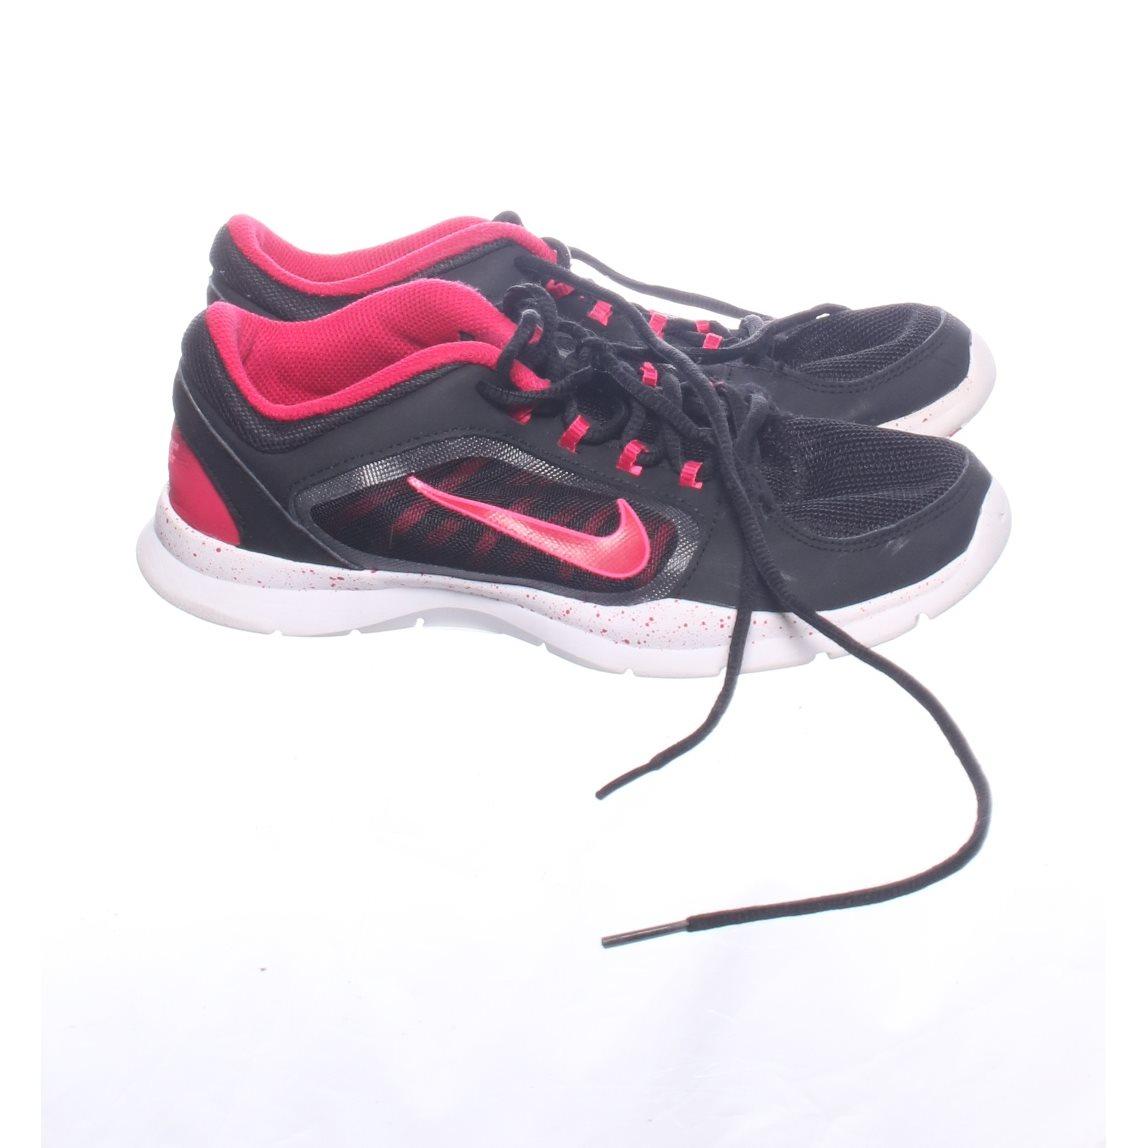 buy online 44293 e1994 Nike, Träningsskor, Strl  36, Flex Trainer 4, Svart Rosa